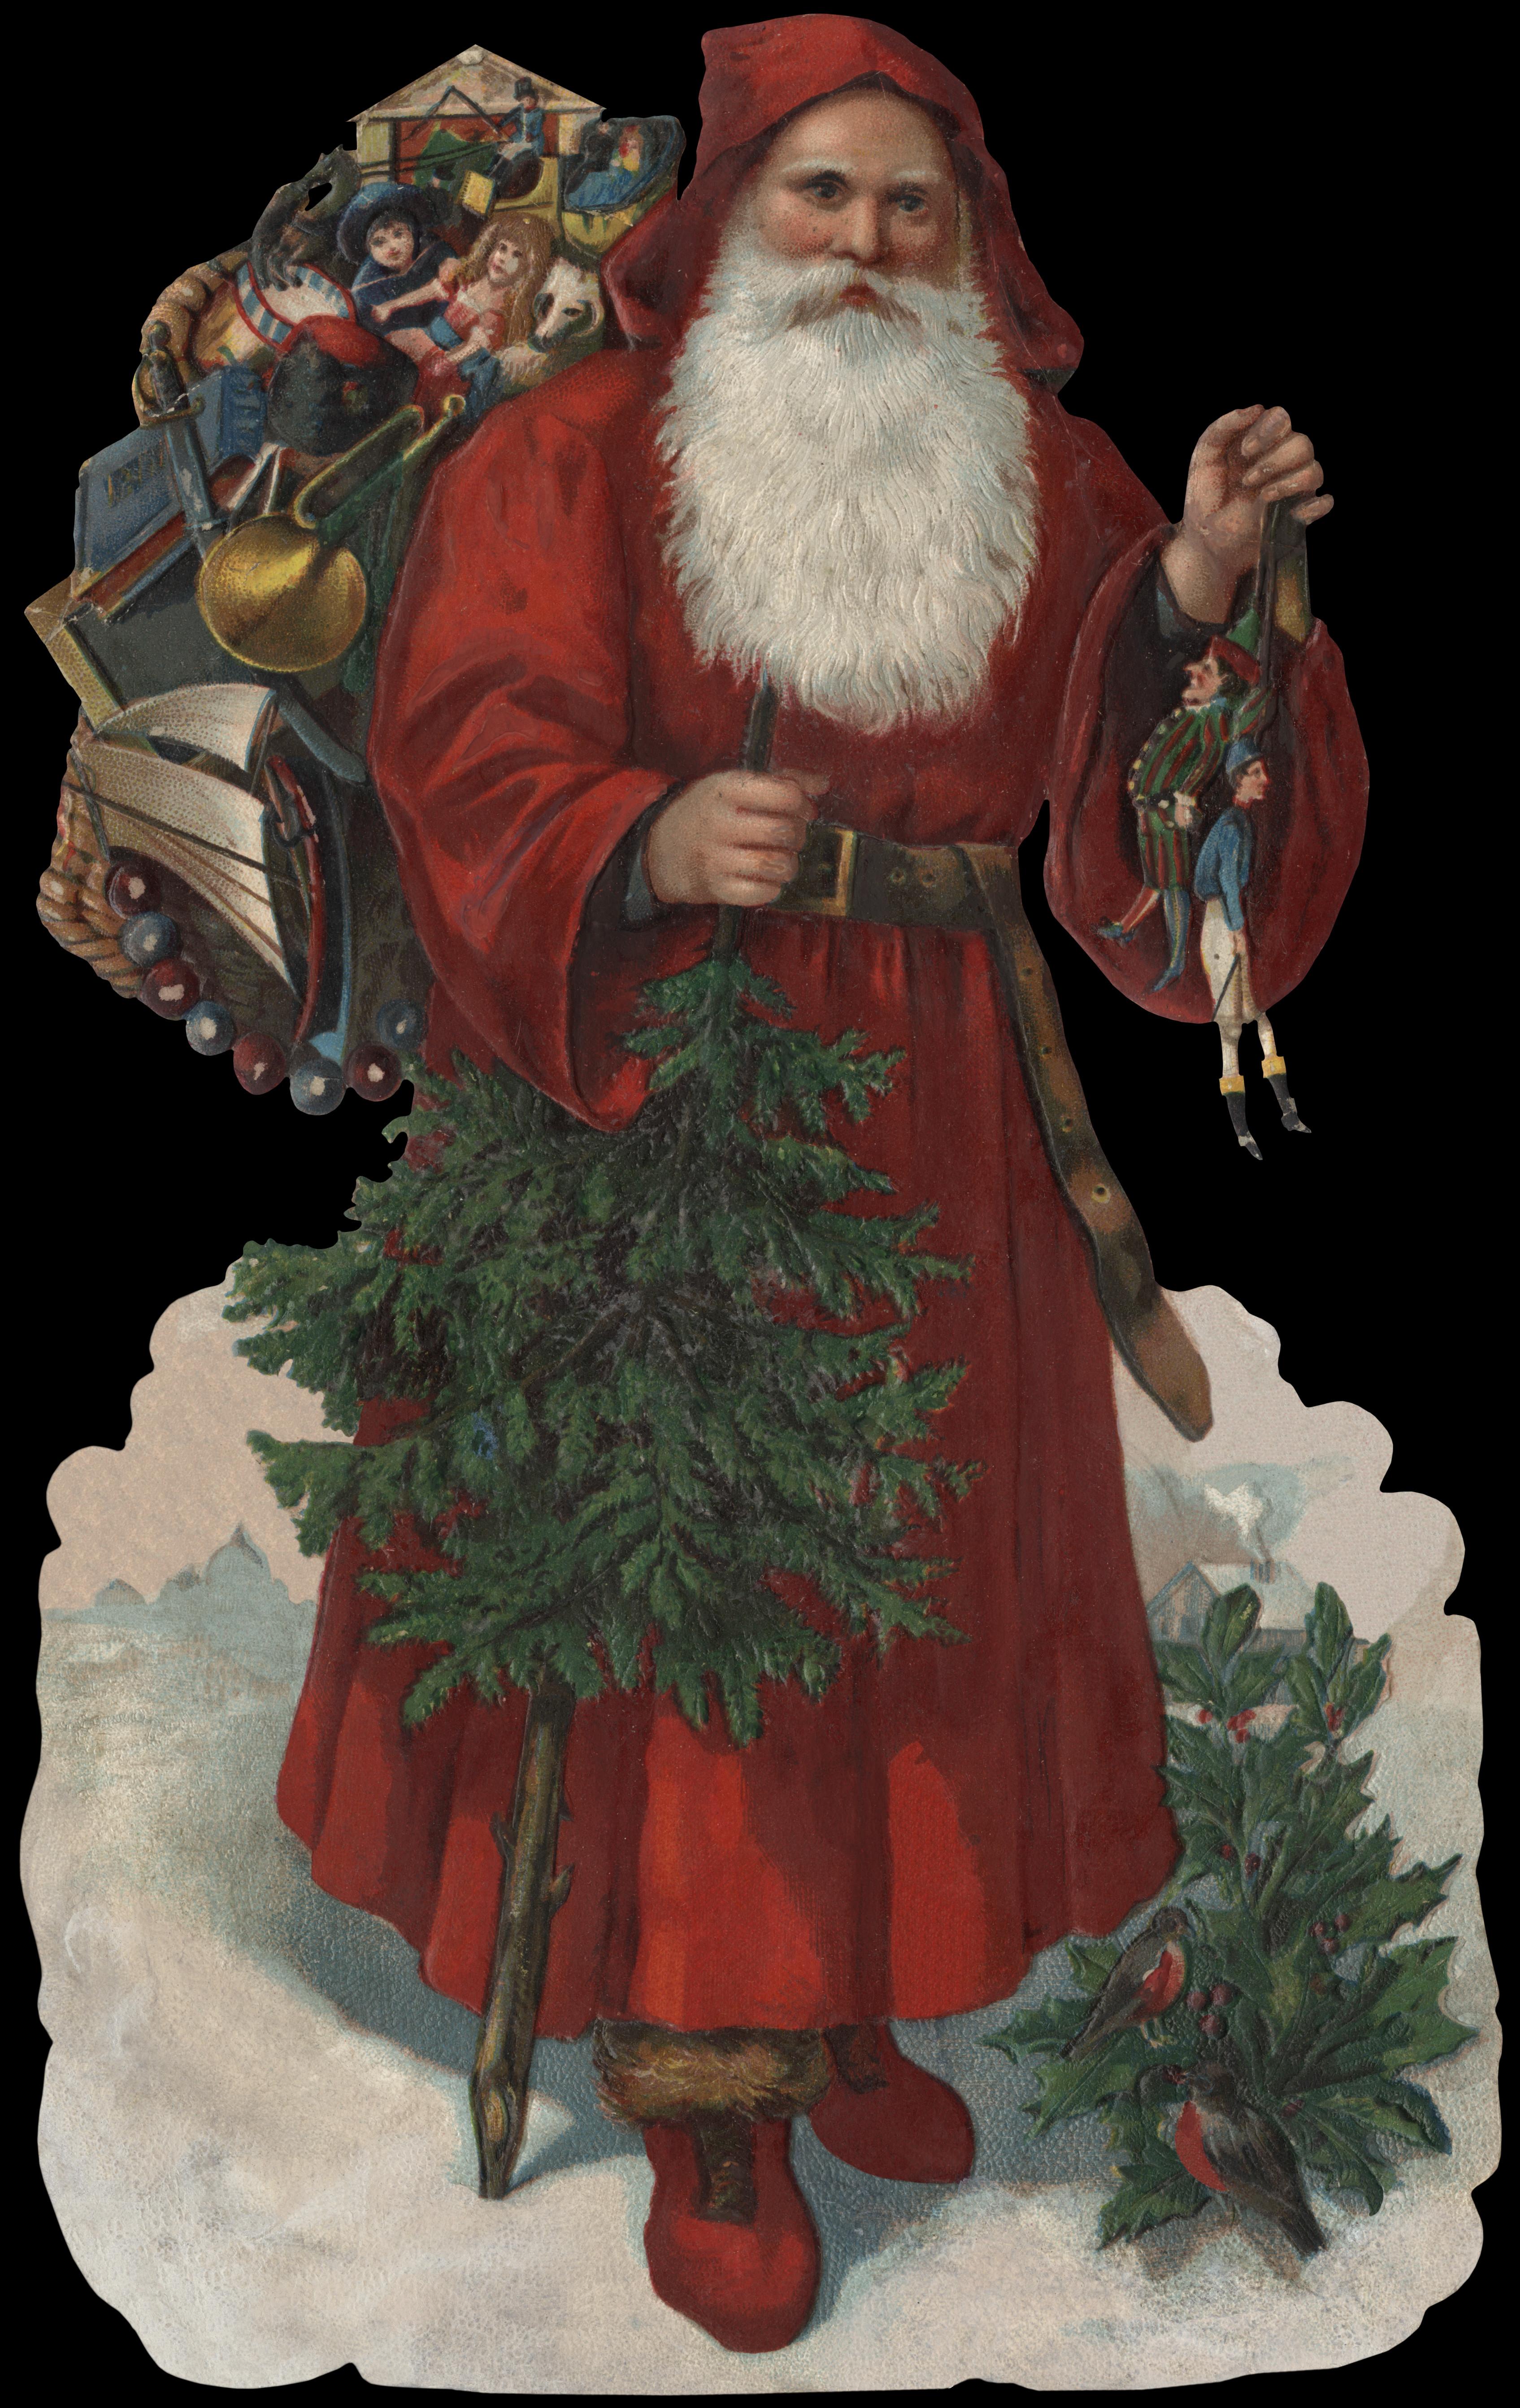 saint nicholas sinter klaas santa claus saint nick 19th century christmas - Santa And Christmas 2